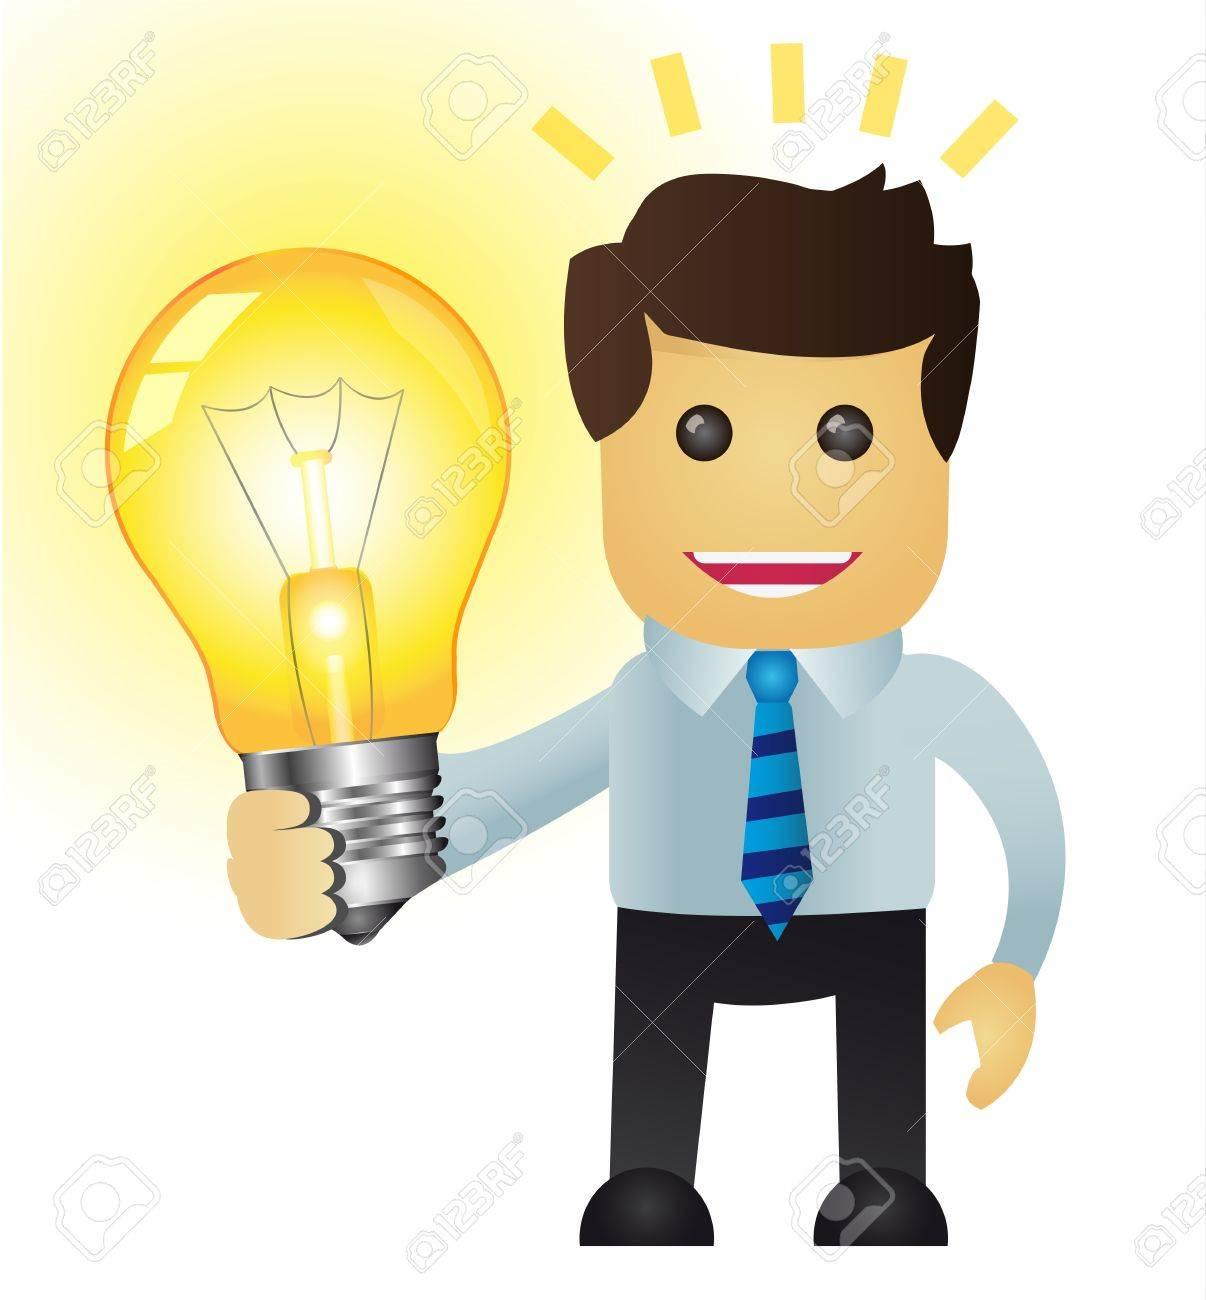 Business man with an Idea Stock Vector - 19020962